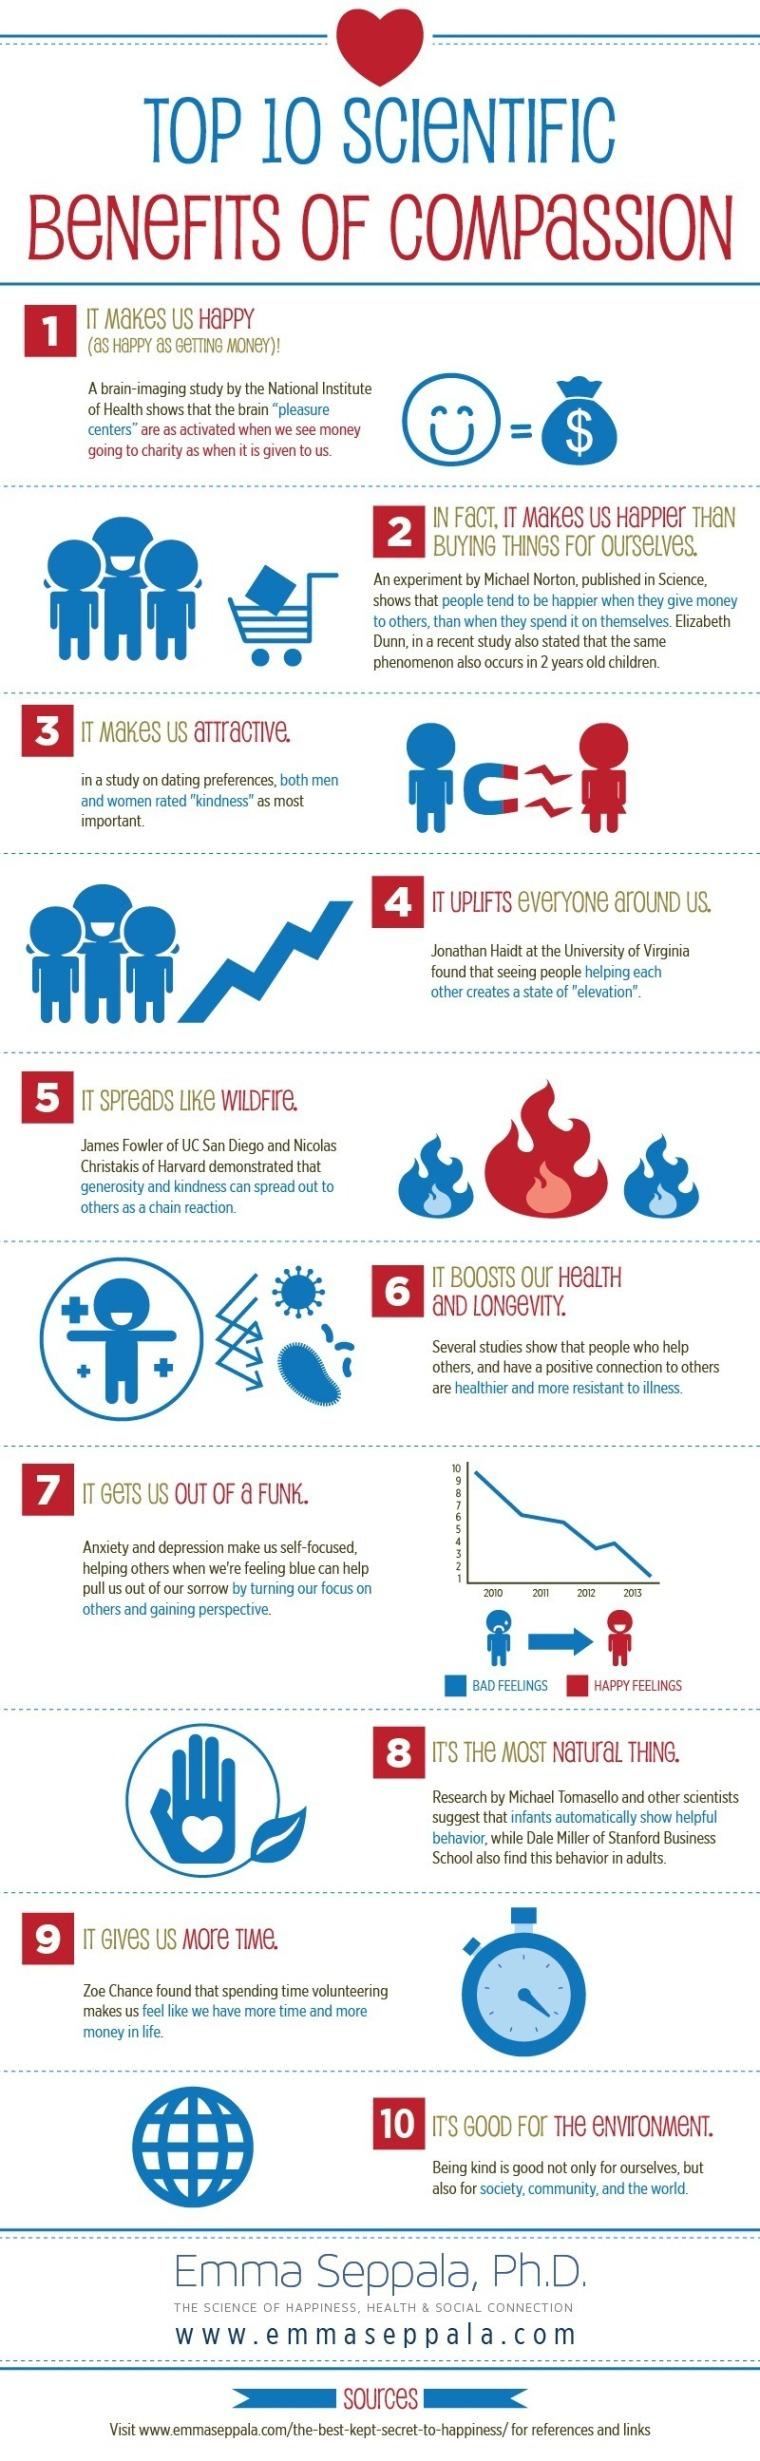 Top 10 Scientific Benefits of Compassion (Infographic)